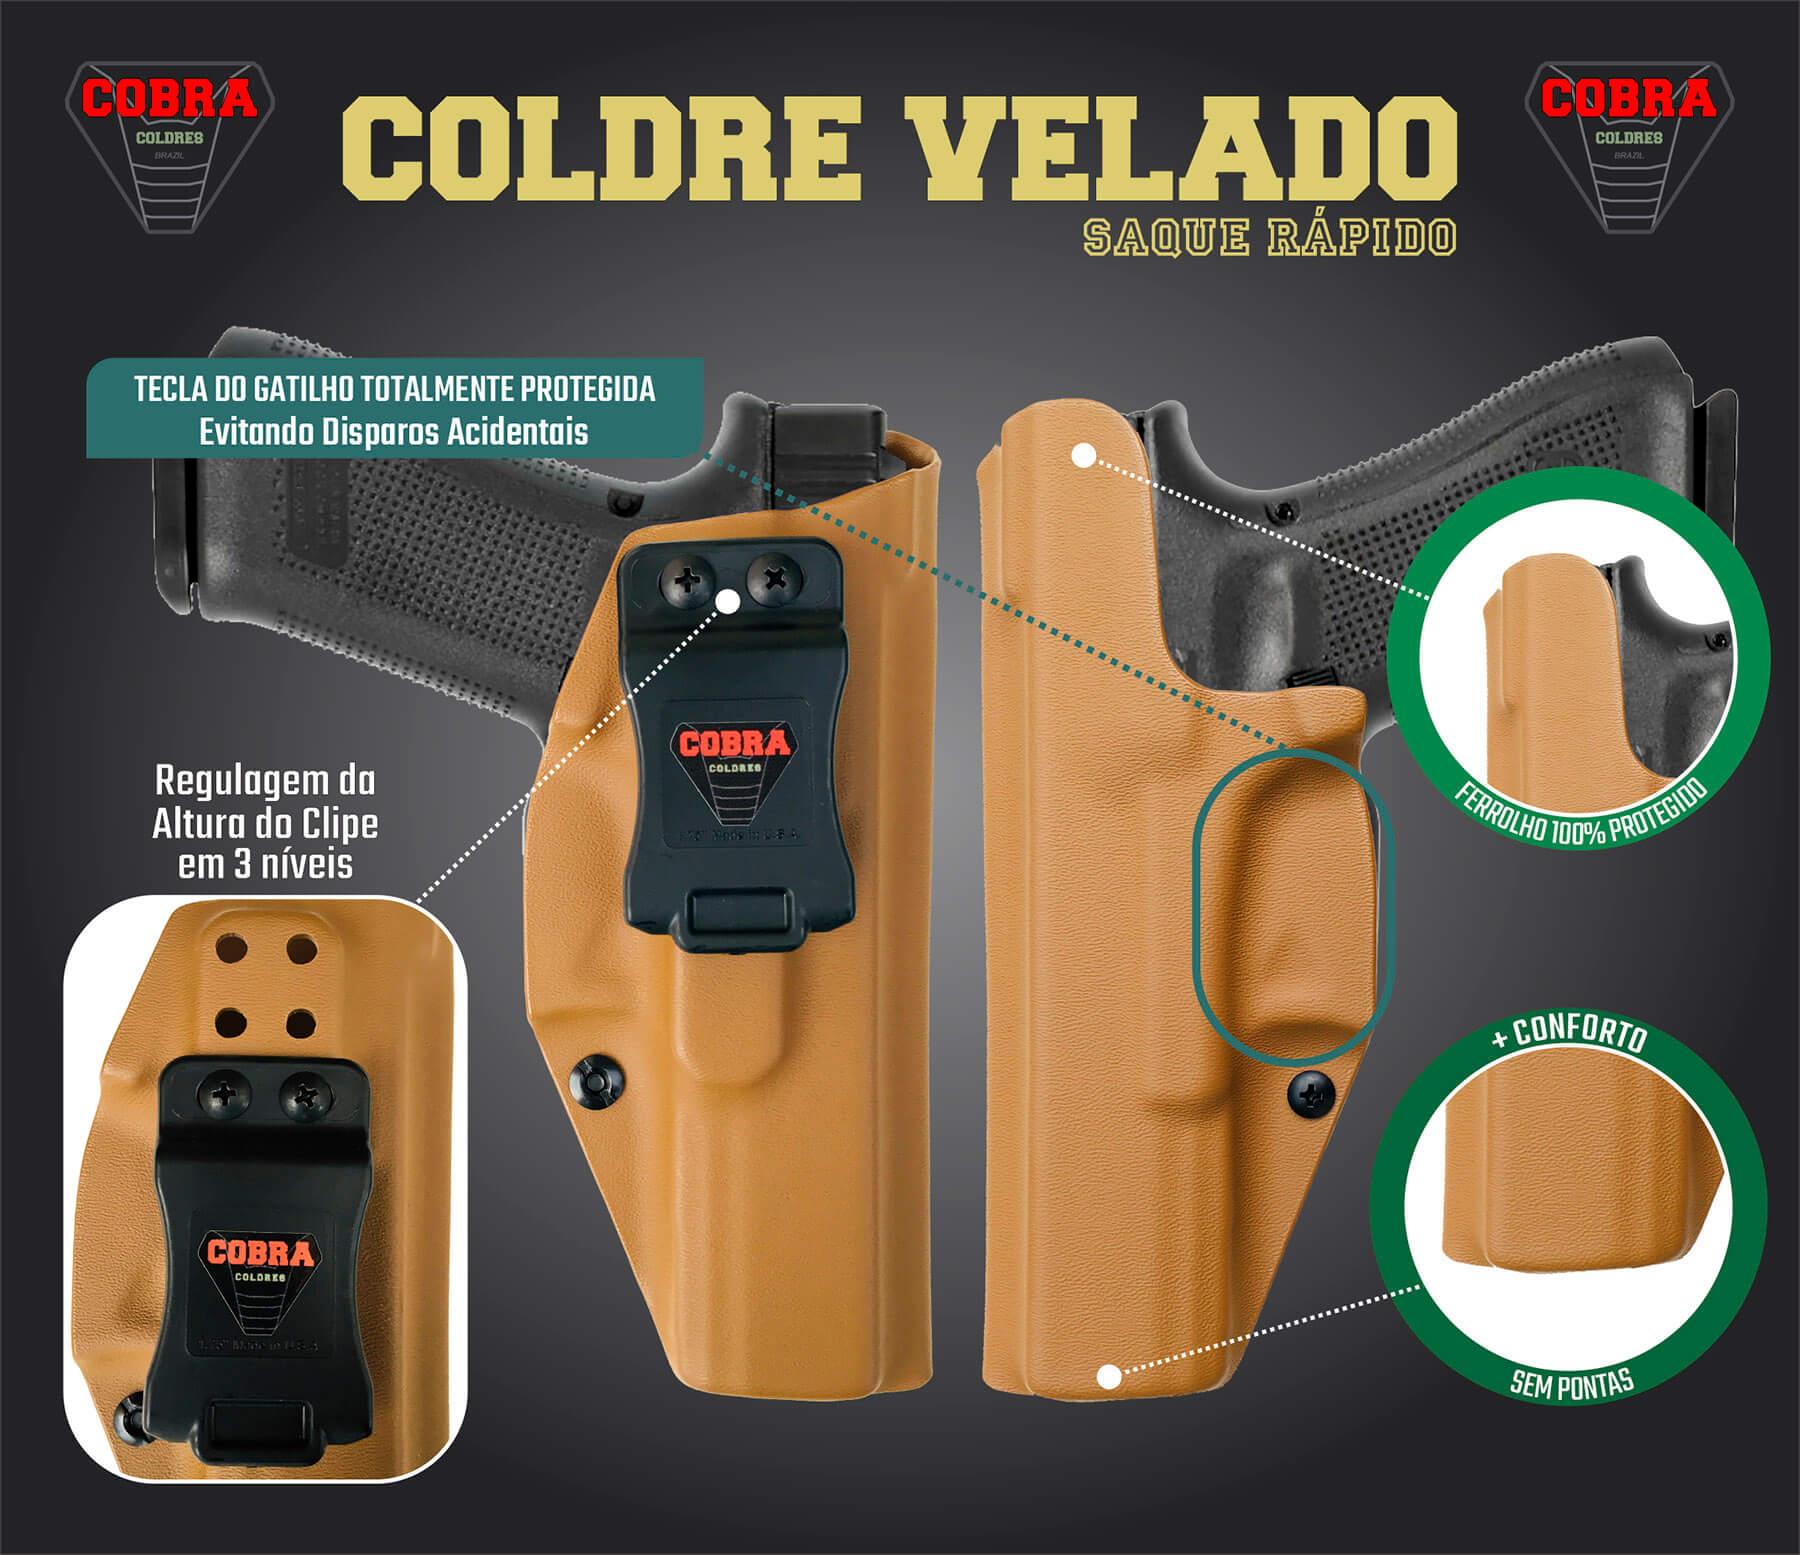 Coldre Glock [G22 Gen5] Kydex + 2 Porta-Carregadores Universais - Saque Rápido Velado Kydex® 080